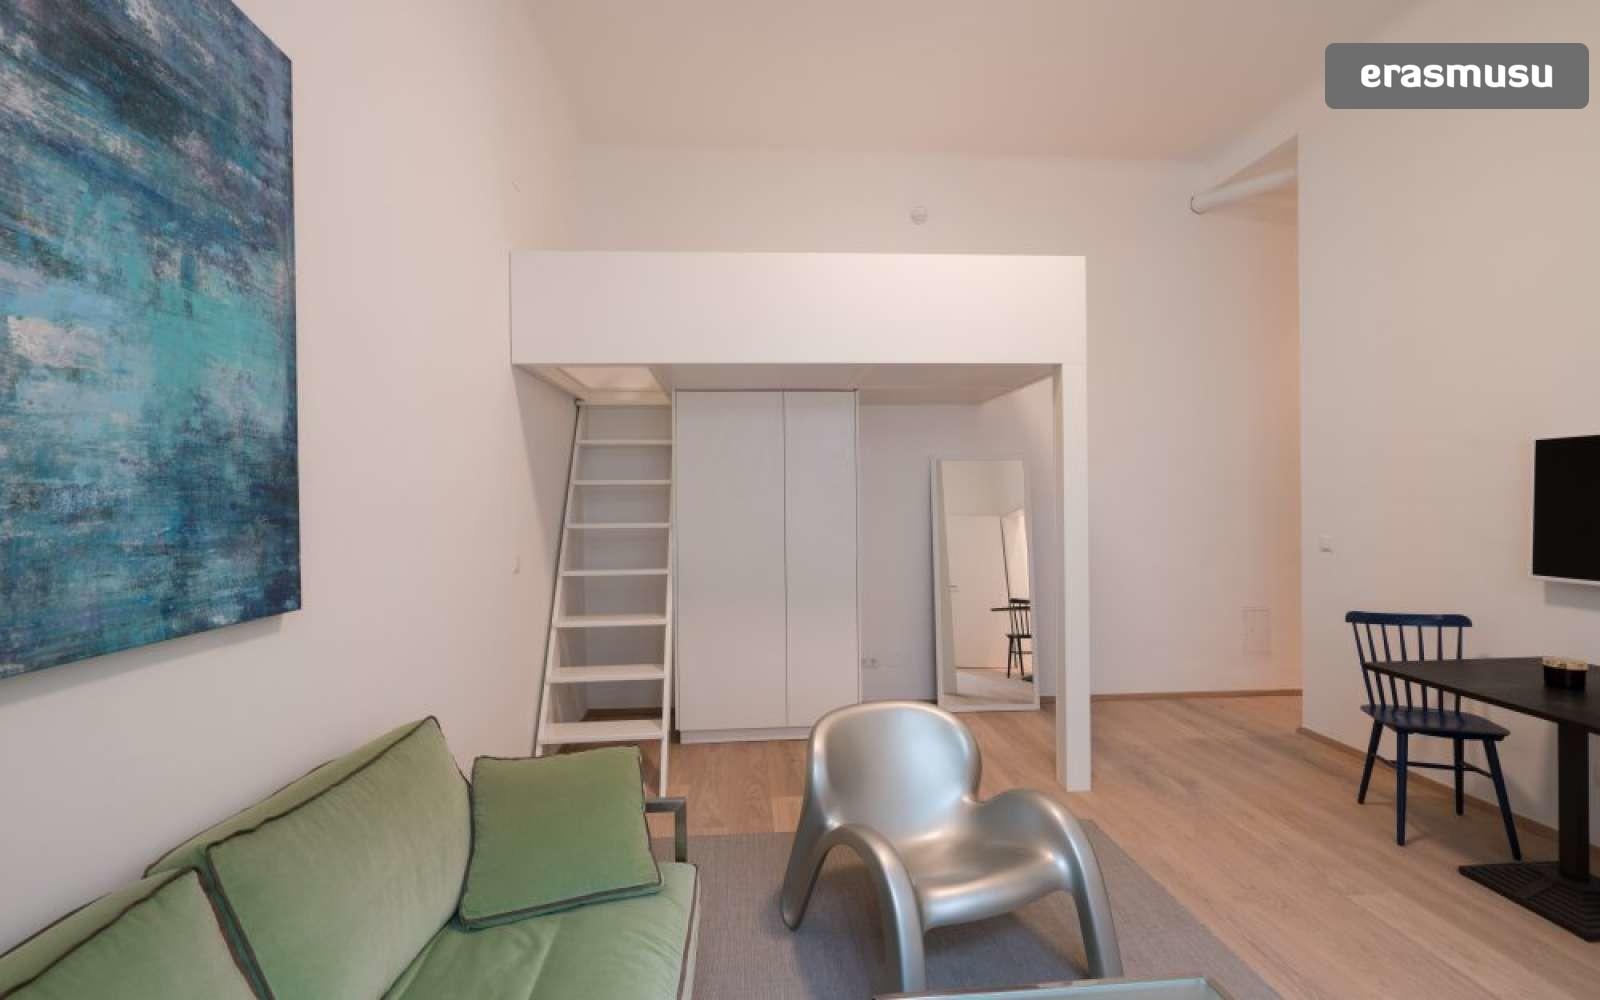 studio-apartment-rent-landstrase-e3cc4c775c04b3297011ada621af8c2